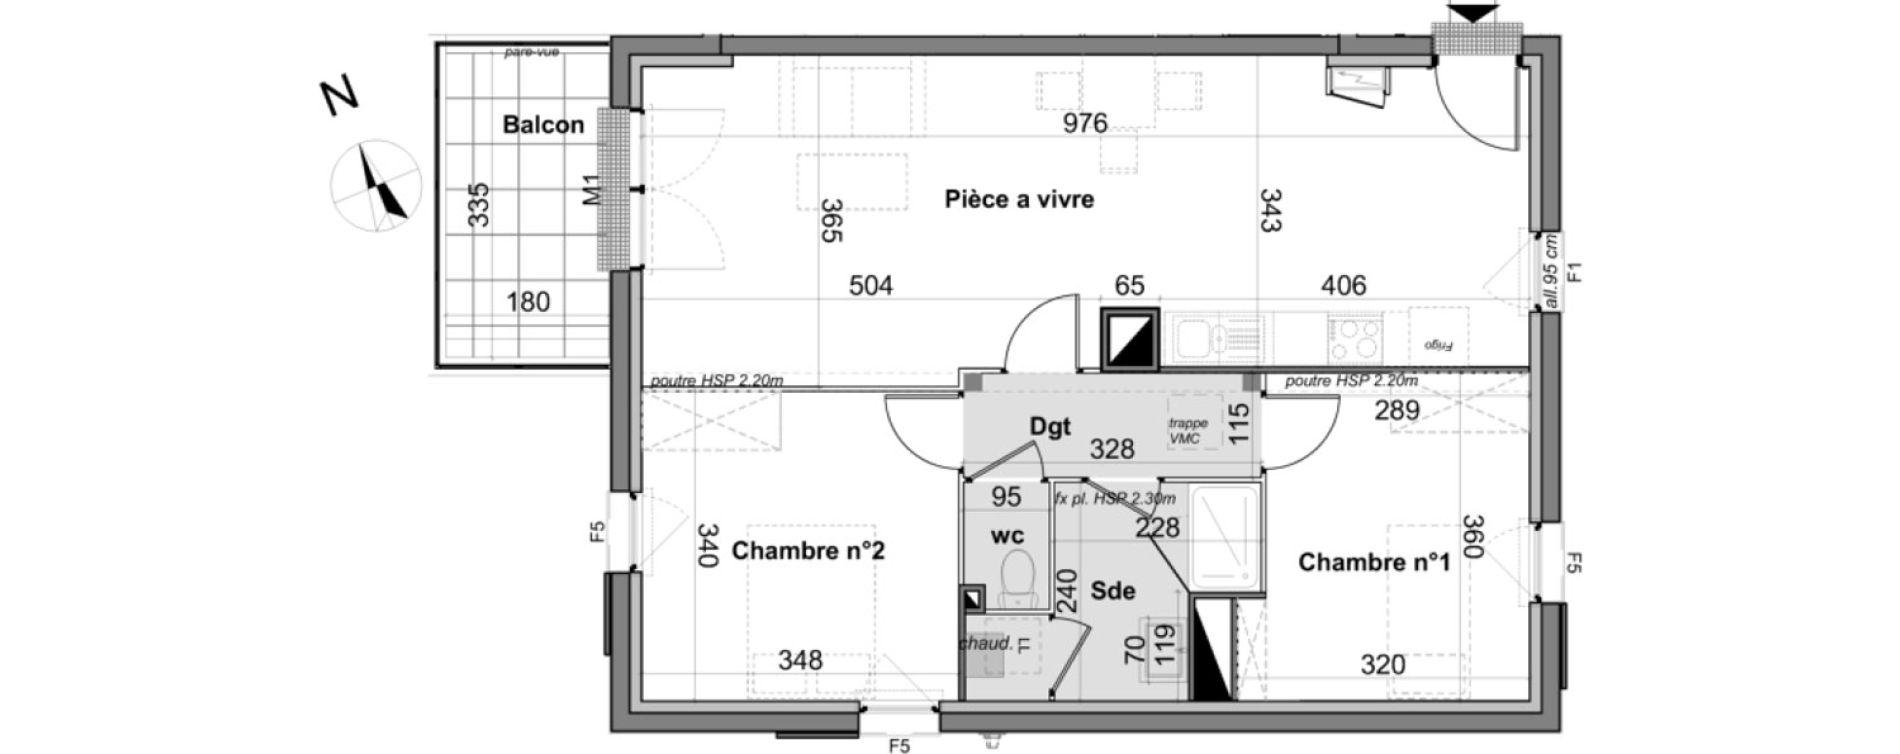 Appartement T3 de 66,17 m2 à Angers Angers madeleine